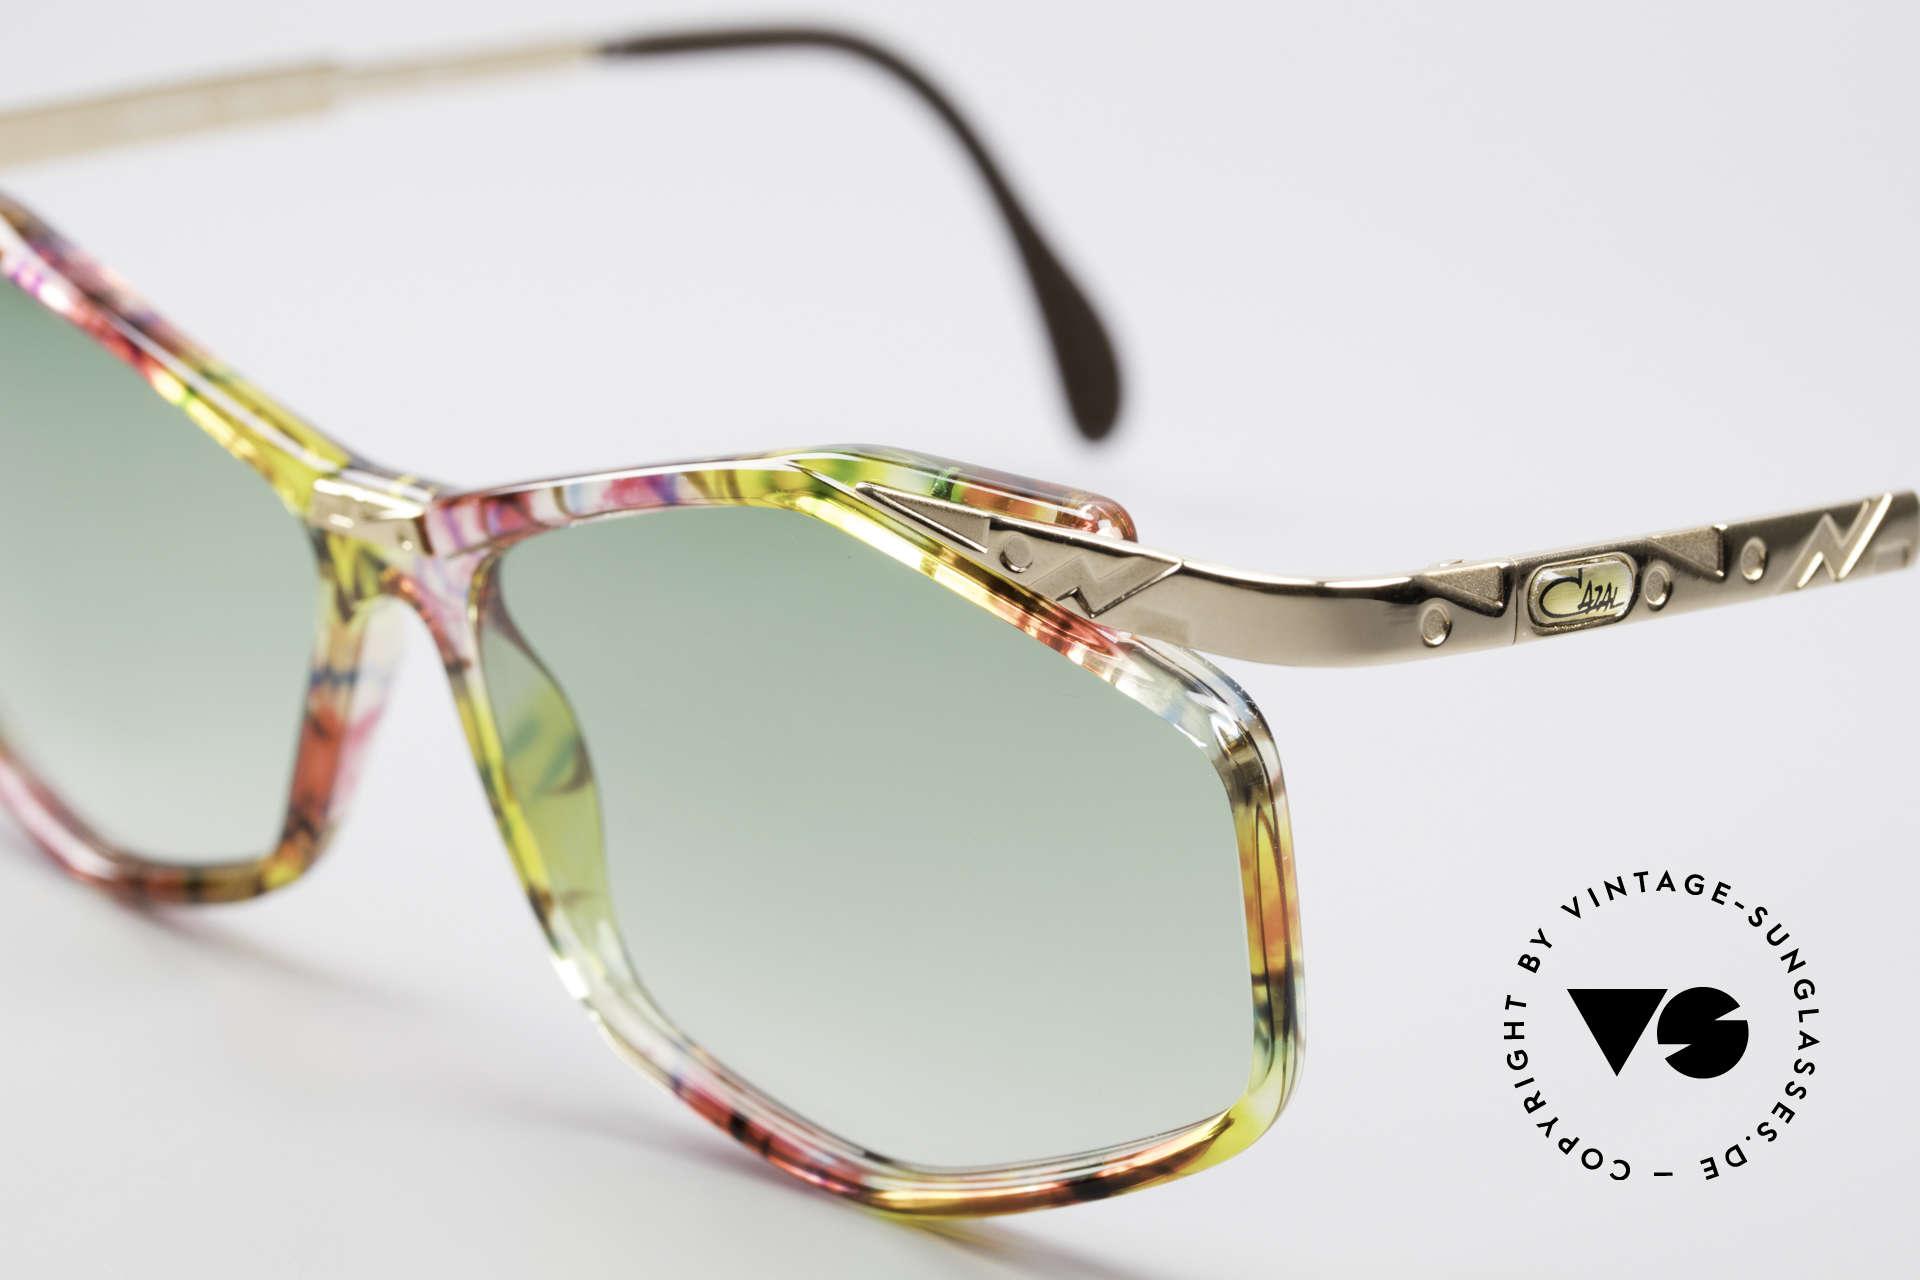 Cazal 354 Vintage 90s Sunglasses Women, never worn (like all our rare vintage Cazal eyewear), Made for Women